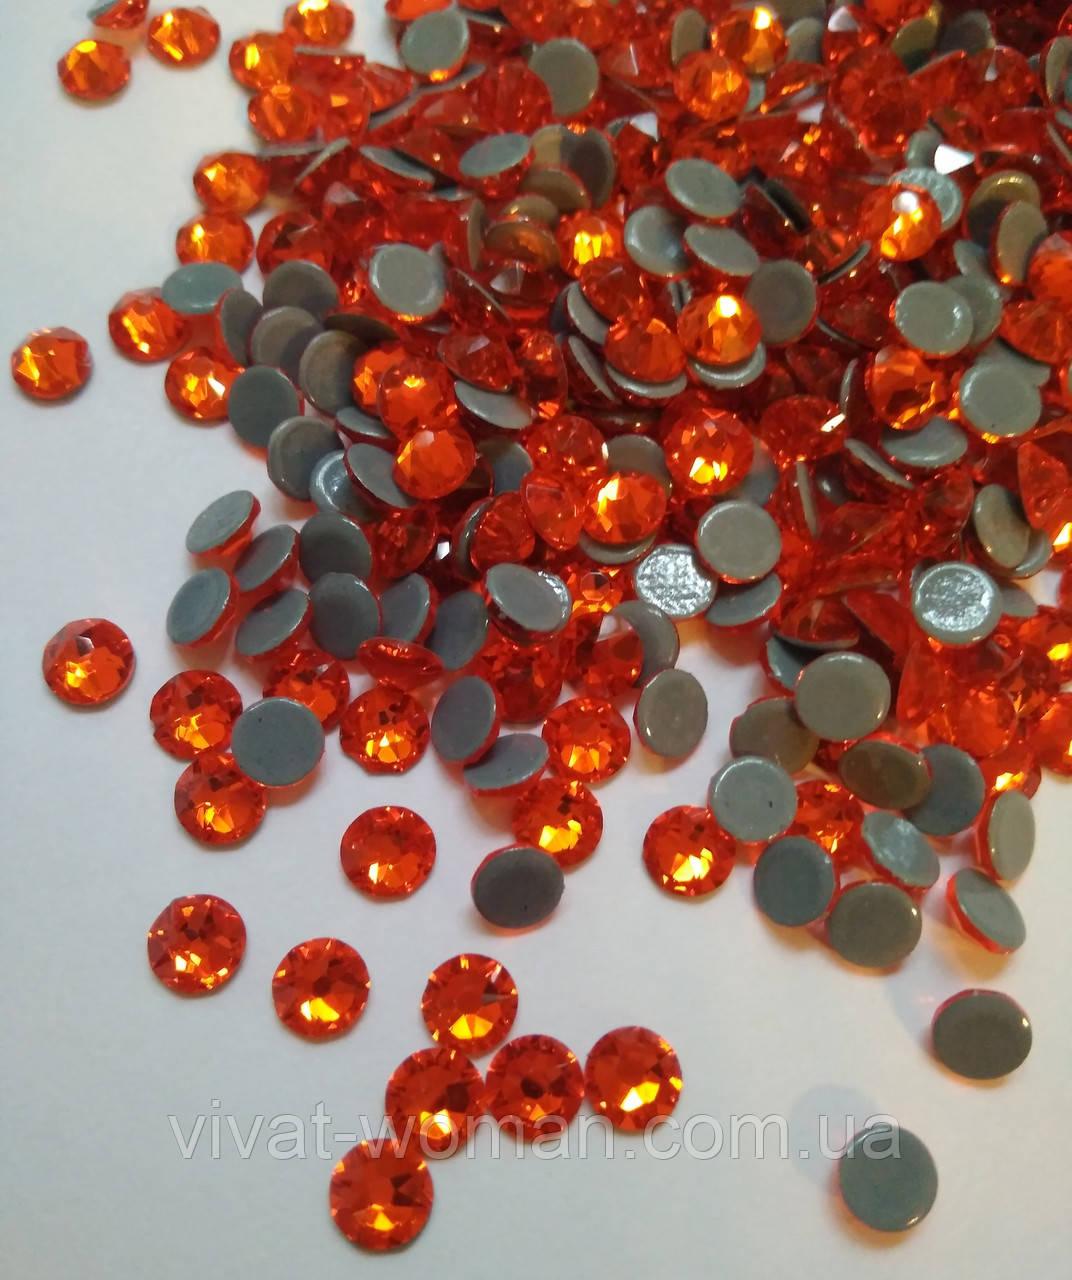 Стразы термоклеевые Xirius SS16 (4,0 мм) Hyacinth, 16 граней. Цена за 144 шт